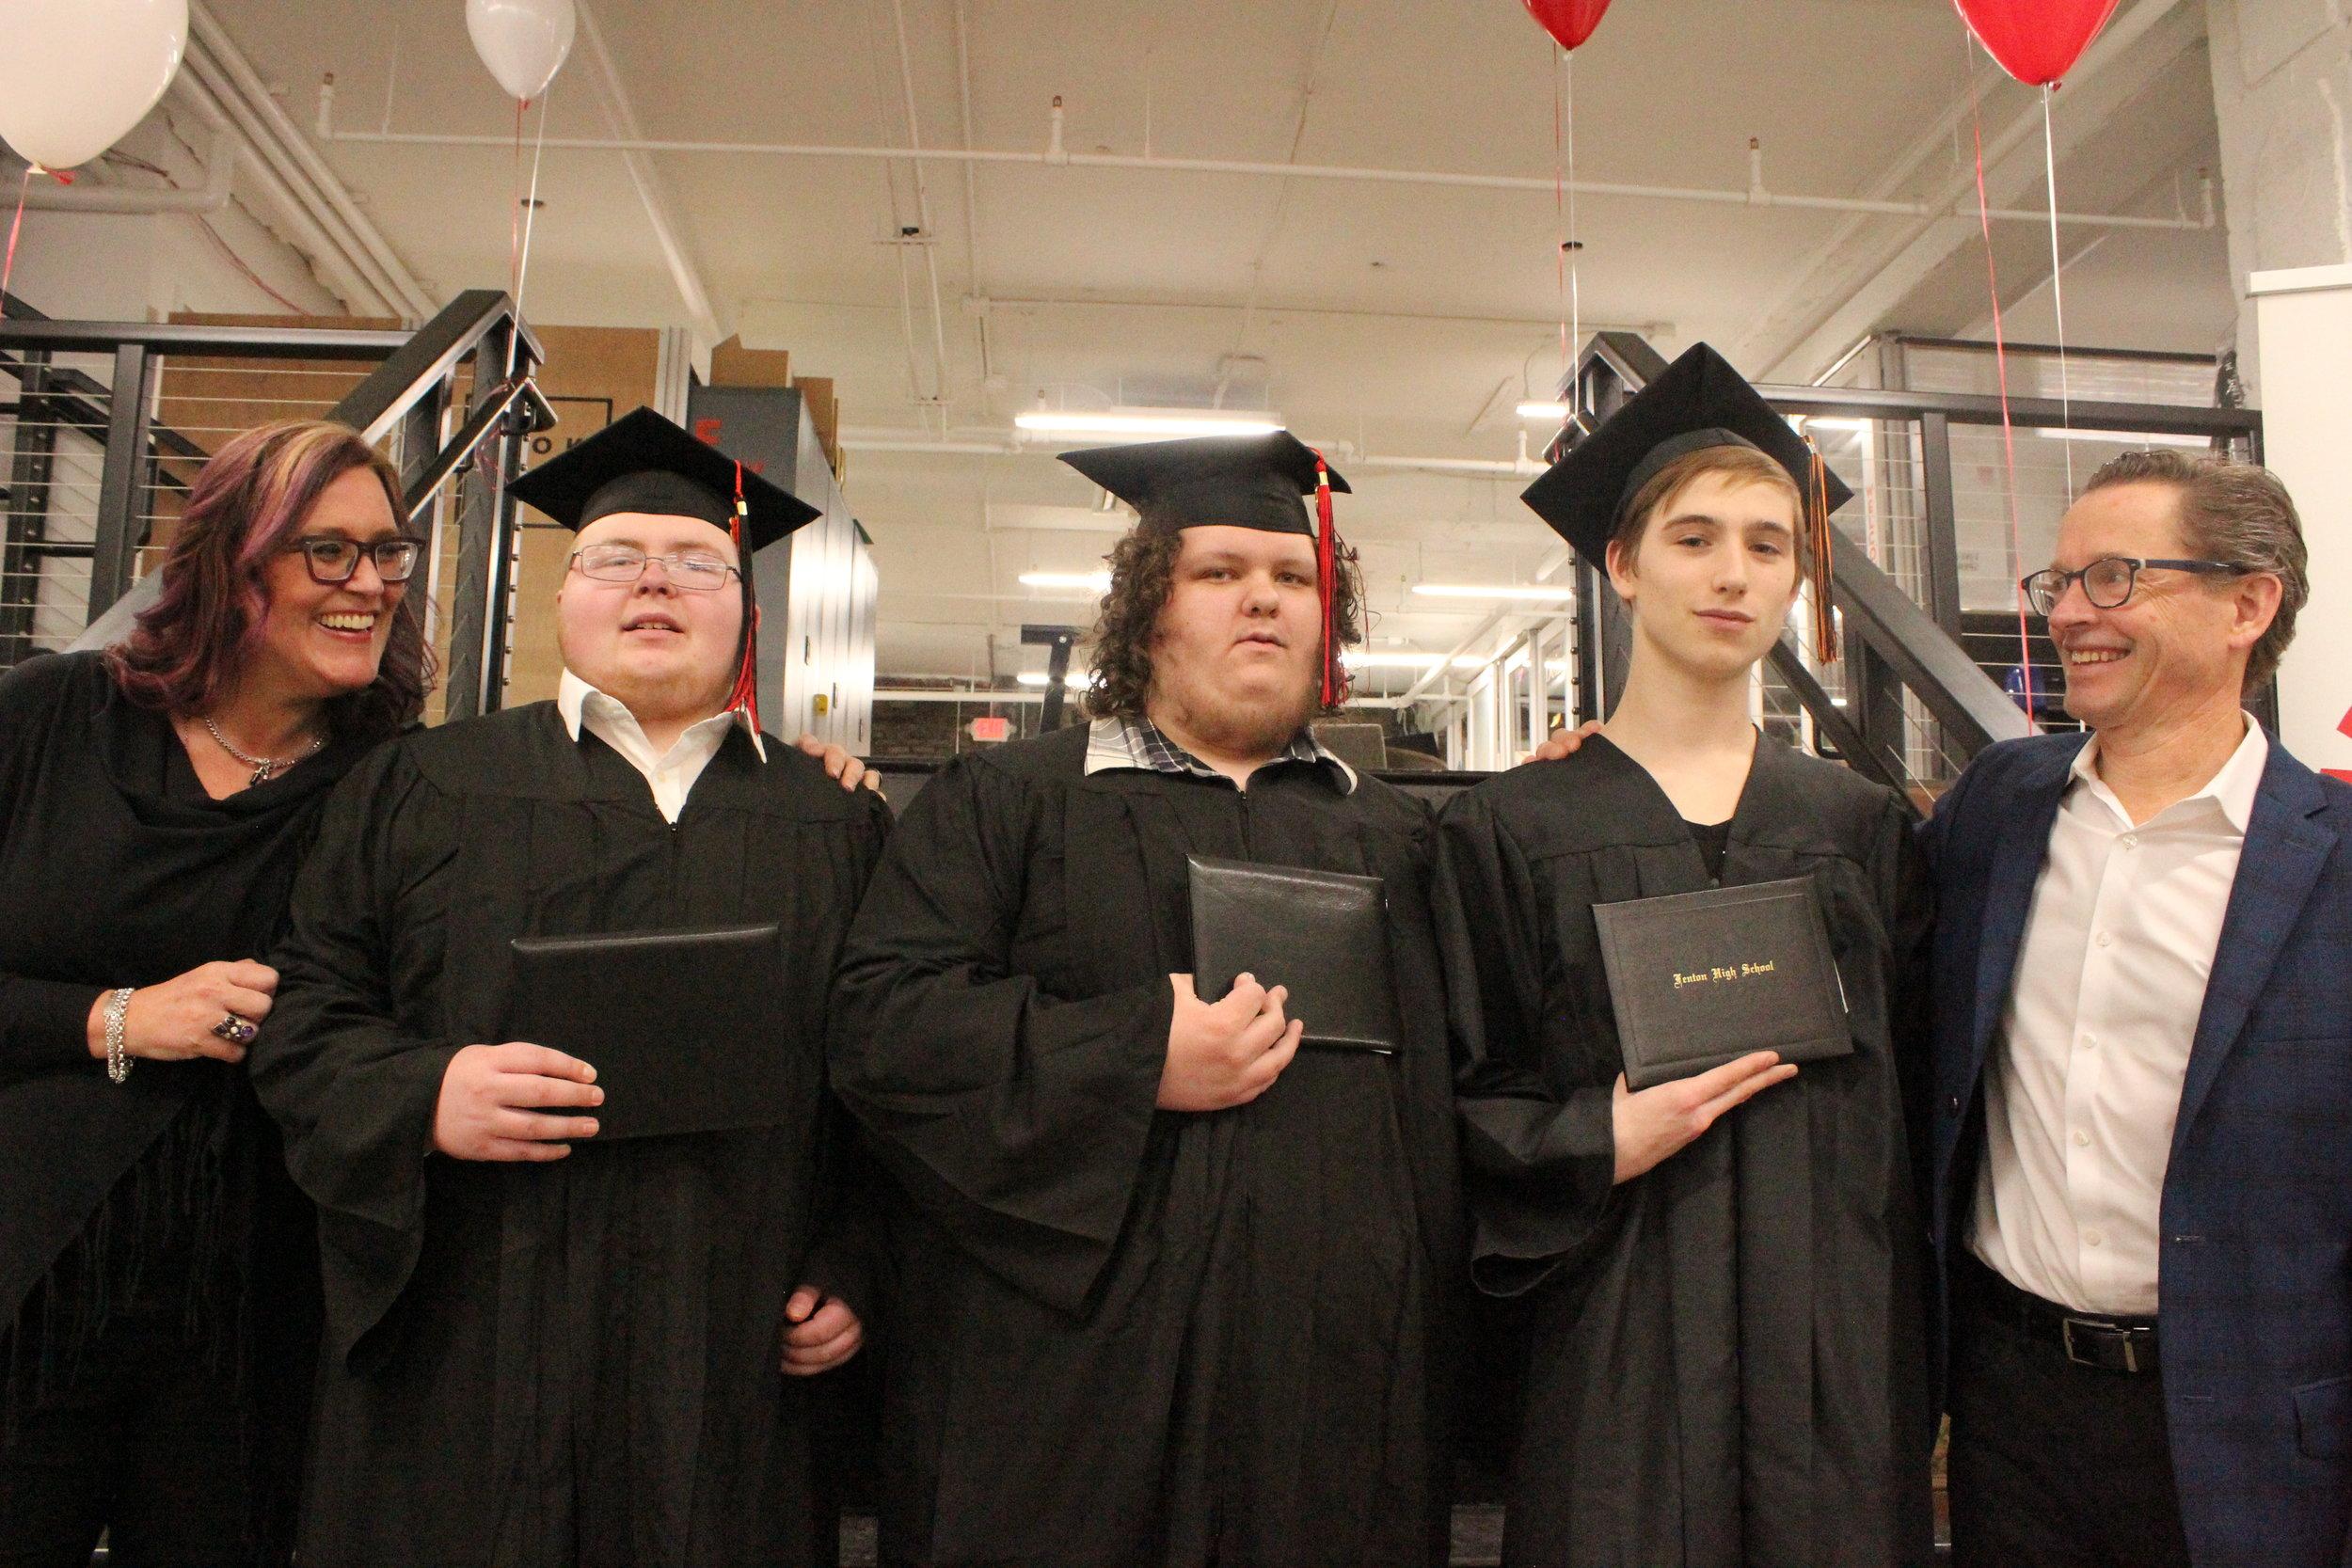 Left to right: Kelly Rodgers, Jed Khon, Justin Hubbard, Ryan Bycynski & Winston Stoody